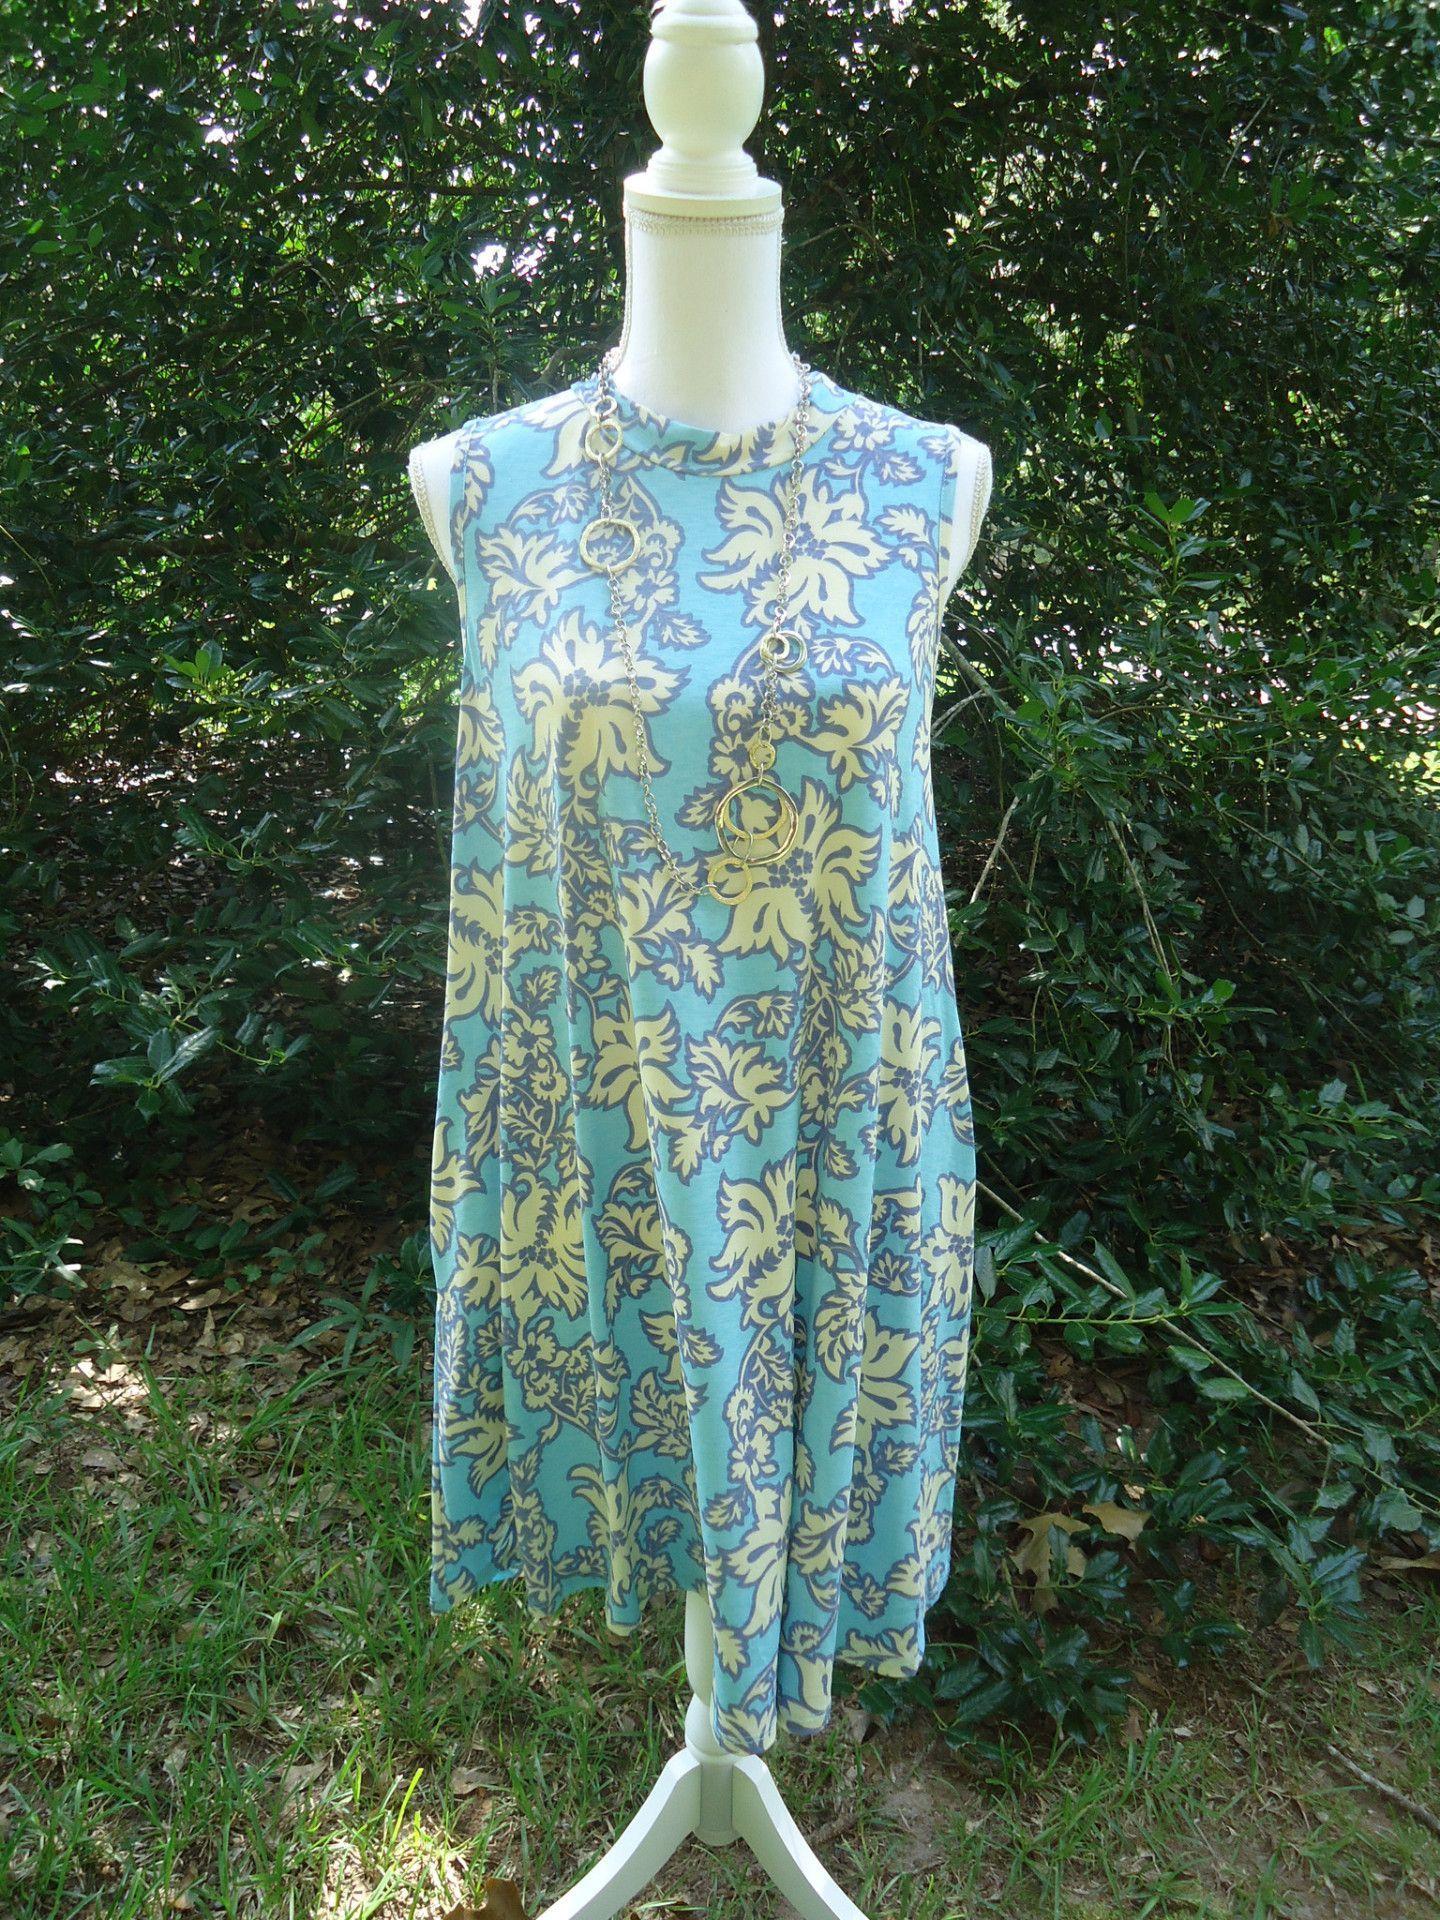 Honeyme 2B Together Adeline 908 Blue Sleeveless Tunic Dress S-L ...